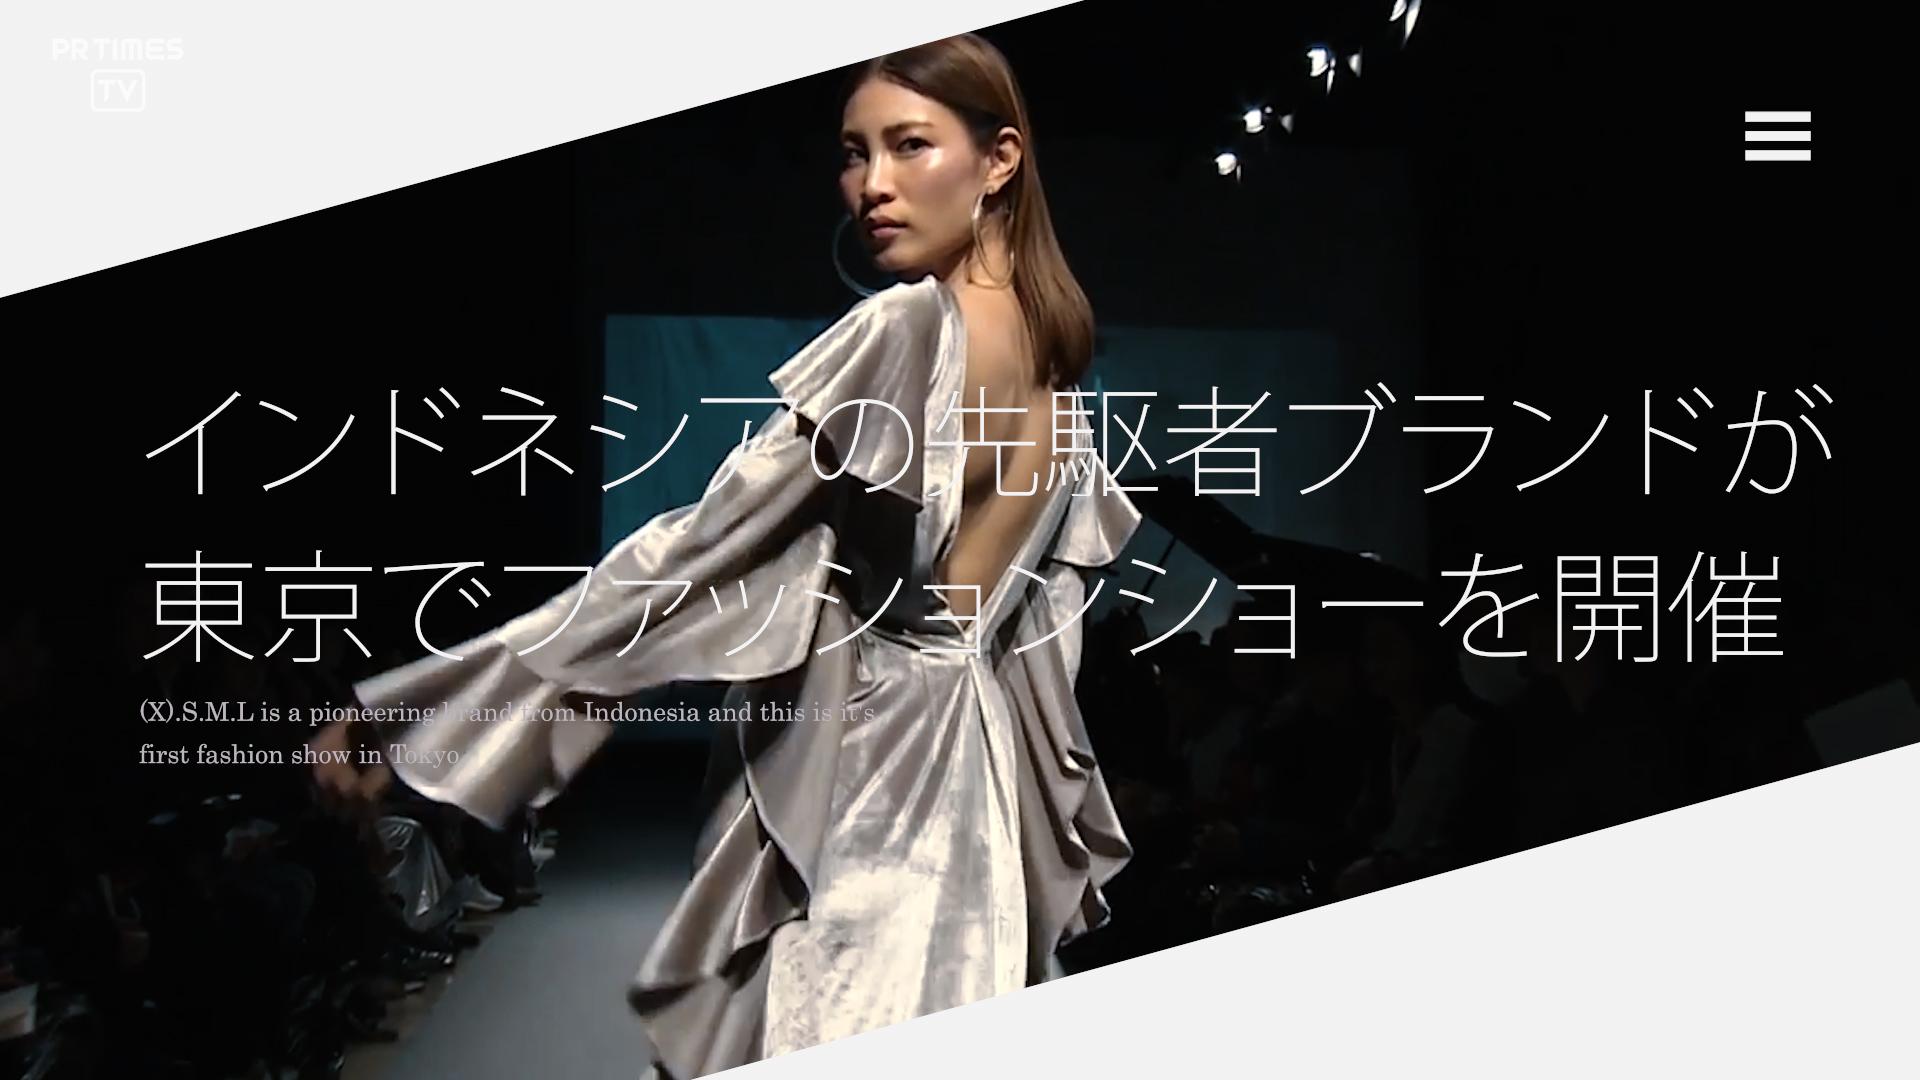 「(X)S.M.L」が東京でファッションショー開催決定!インドネシアの先駆者ブランドが2019-20年秋冬コレクションを発表